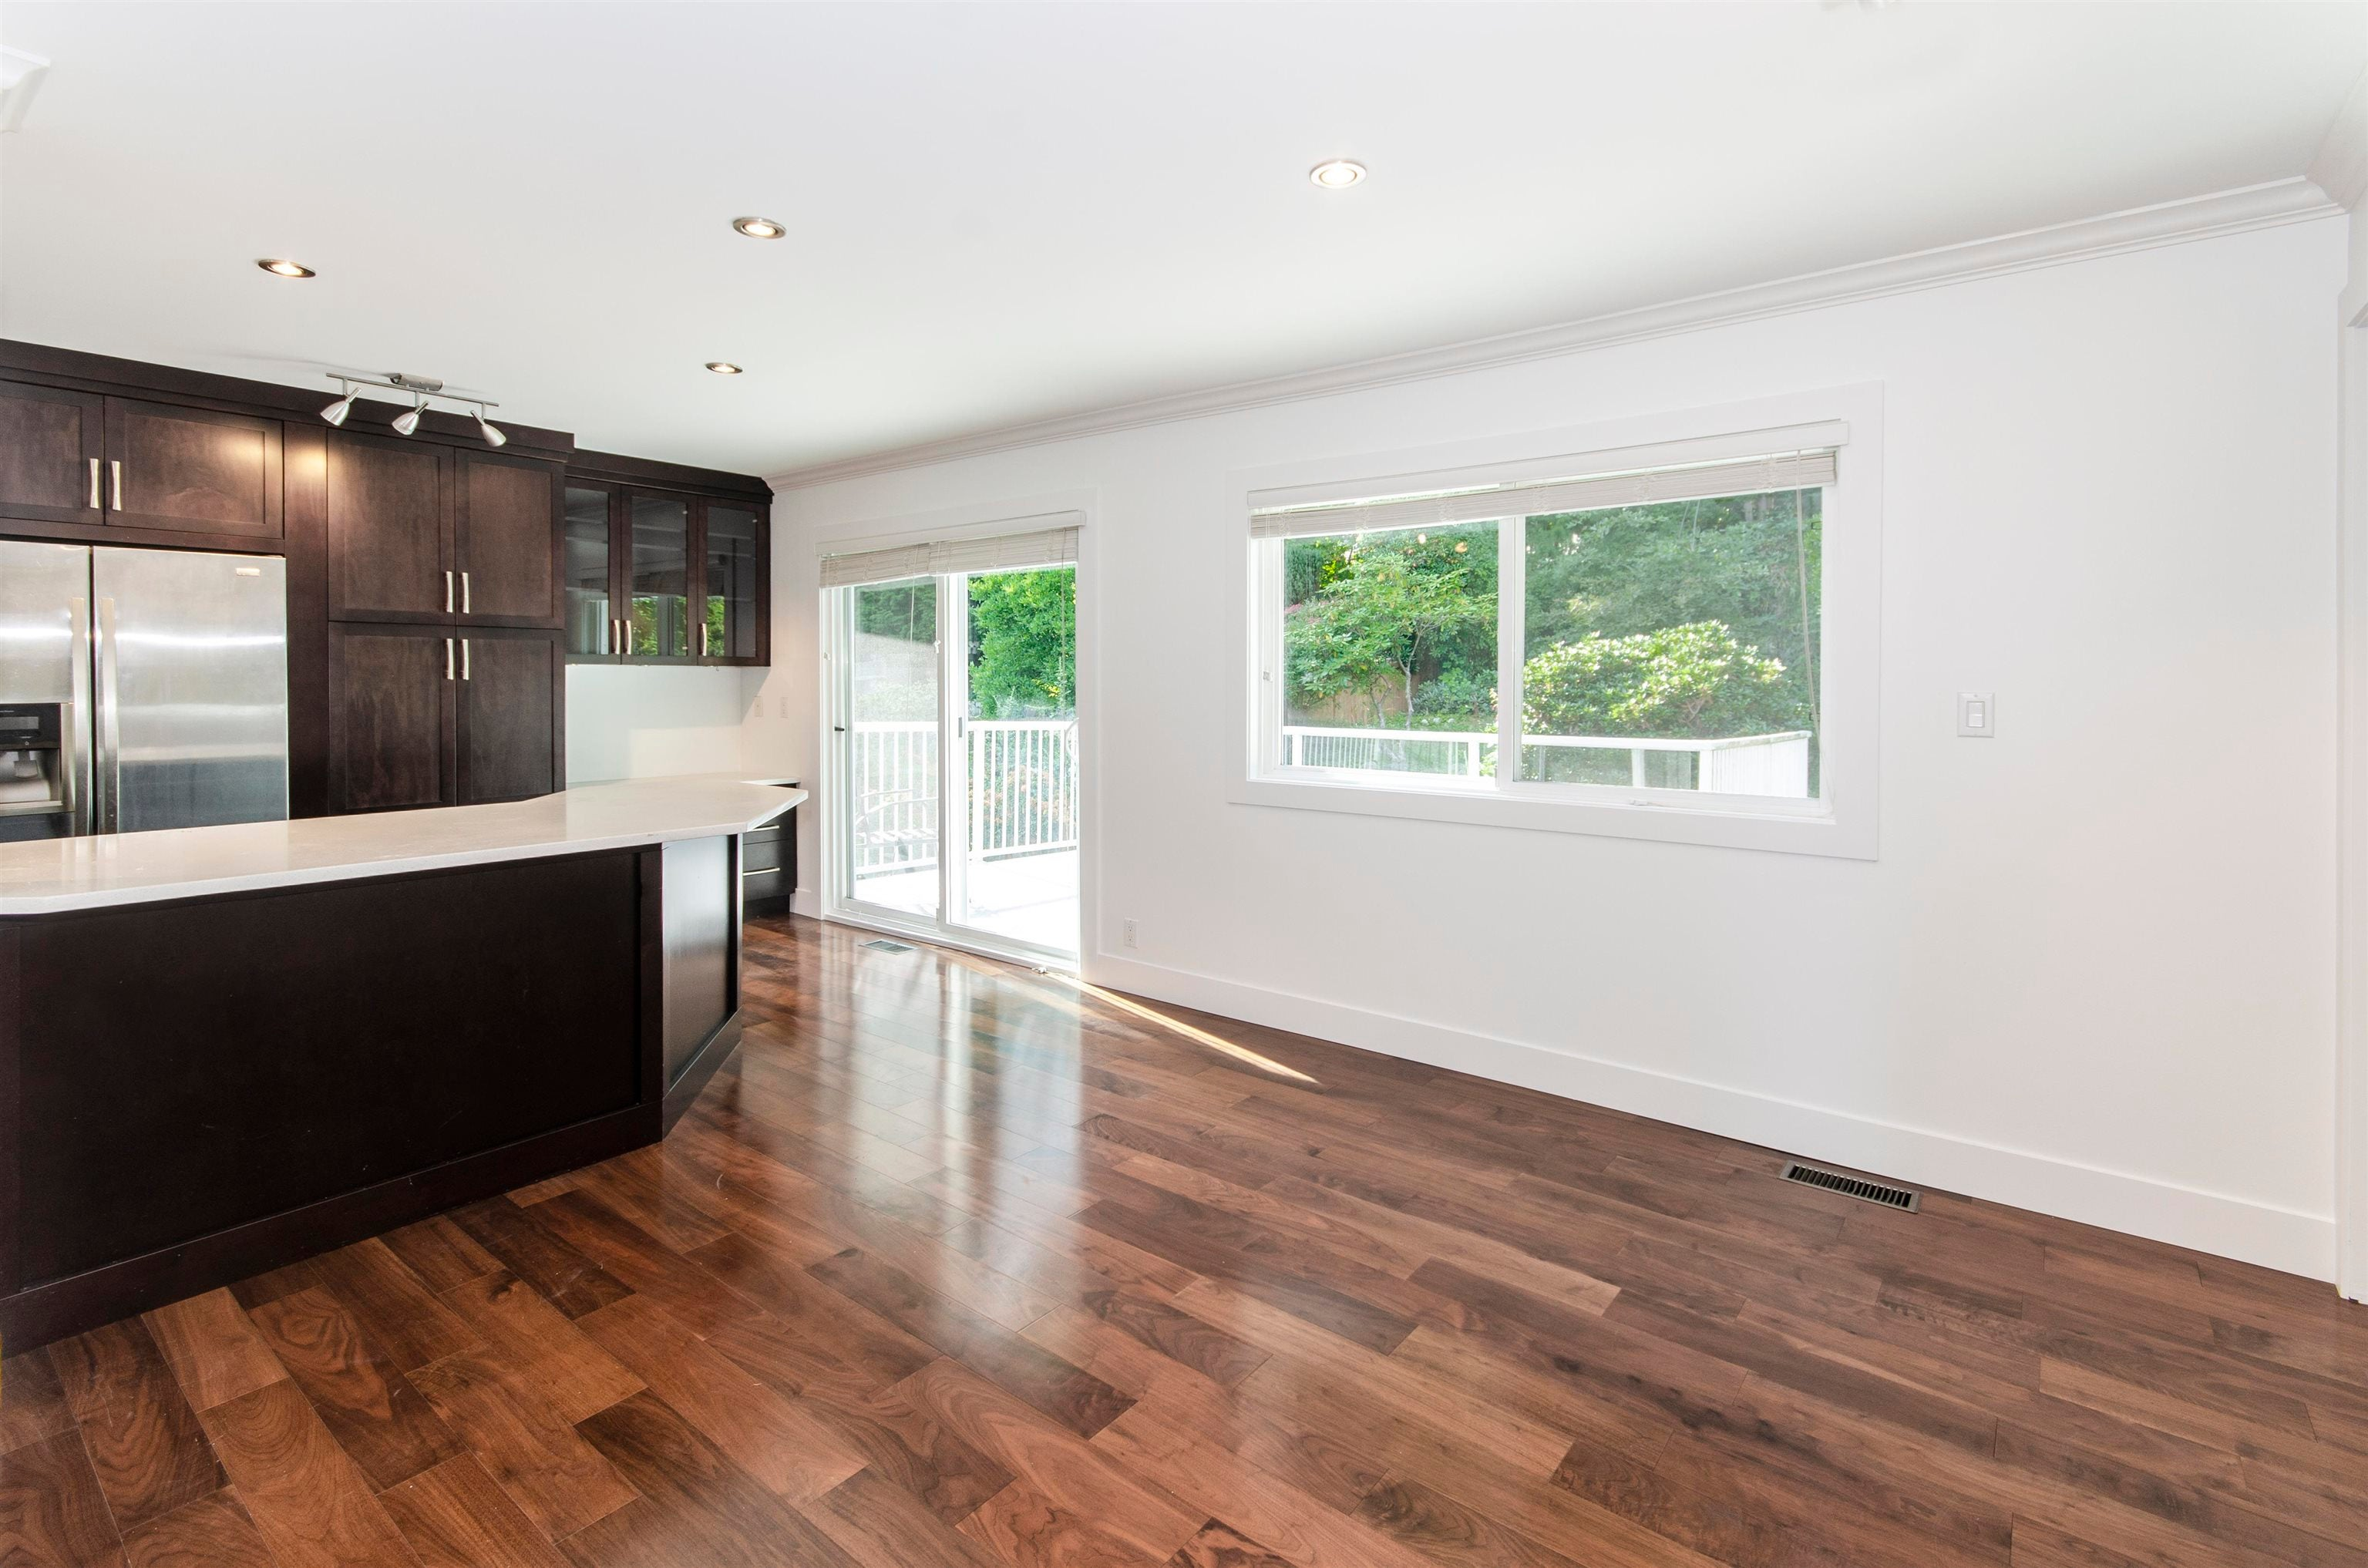 3785 REGENT AVENUE - Upper Lonsdale House/Single Family for sale, 4 Bedrooms (R2617648) - #10